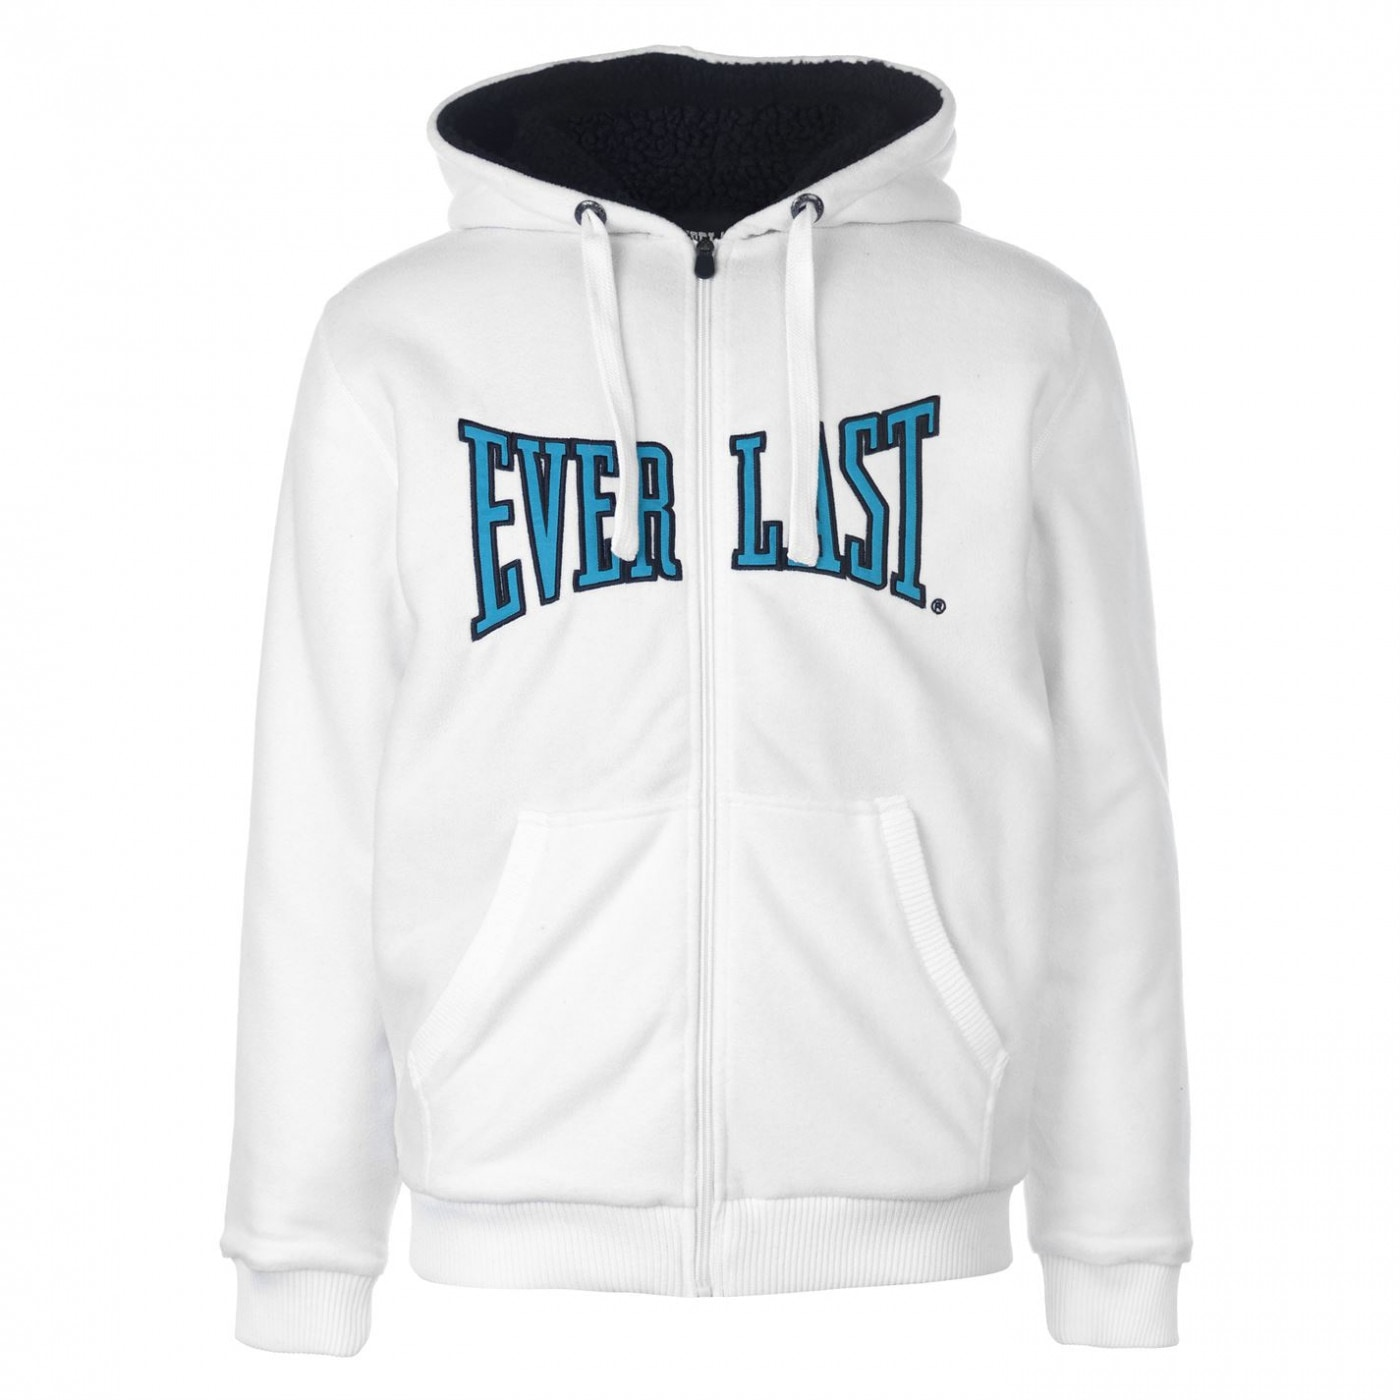 Everlast Fleece Zip Logo pánska mikina